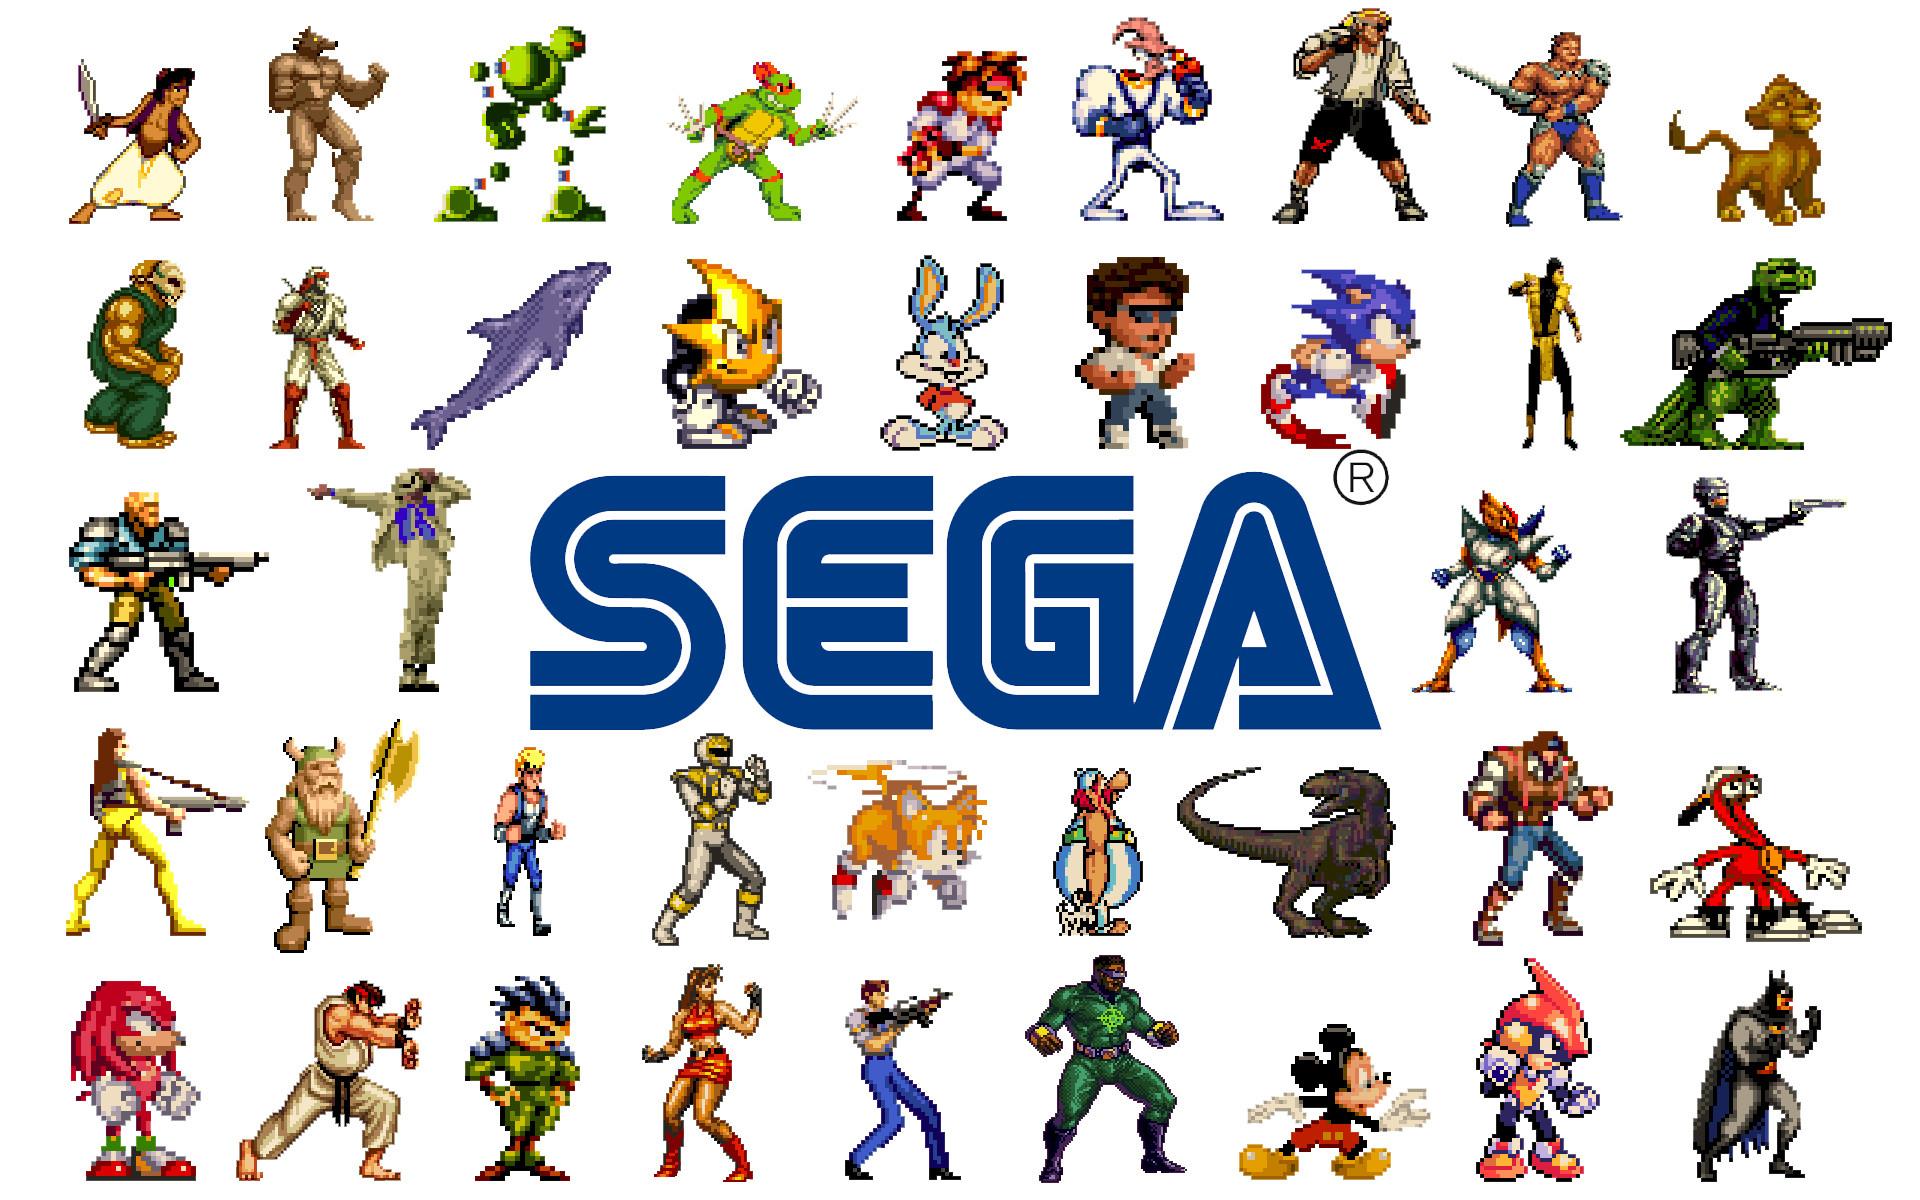 Sega dreamcast 10th anniversary | Sega Wallpapers 0 HTML code. 31PM // 19  notes